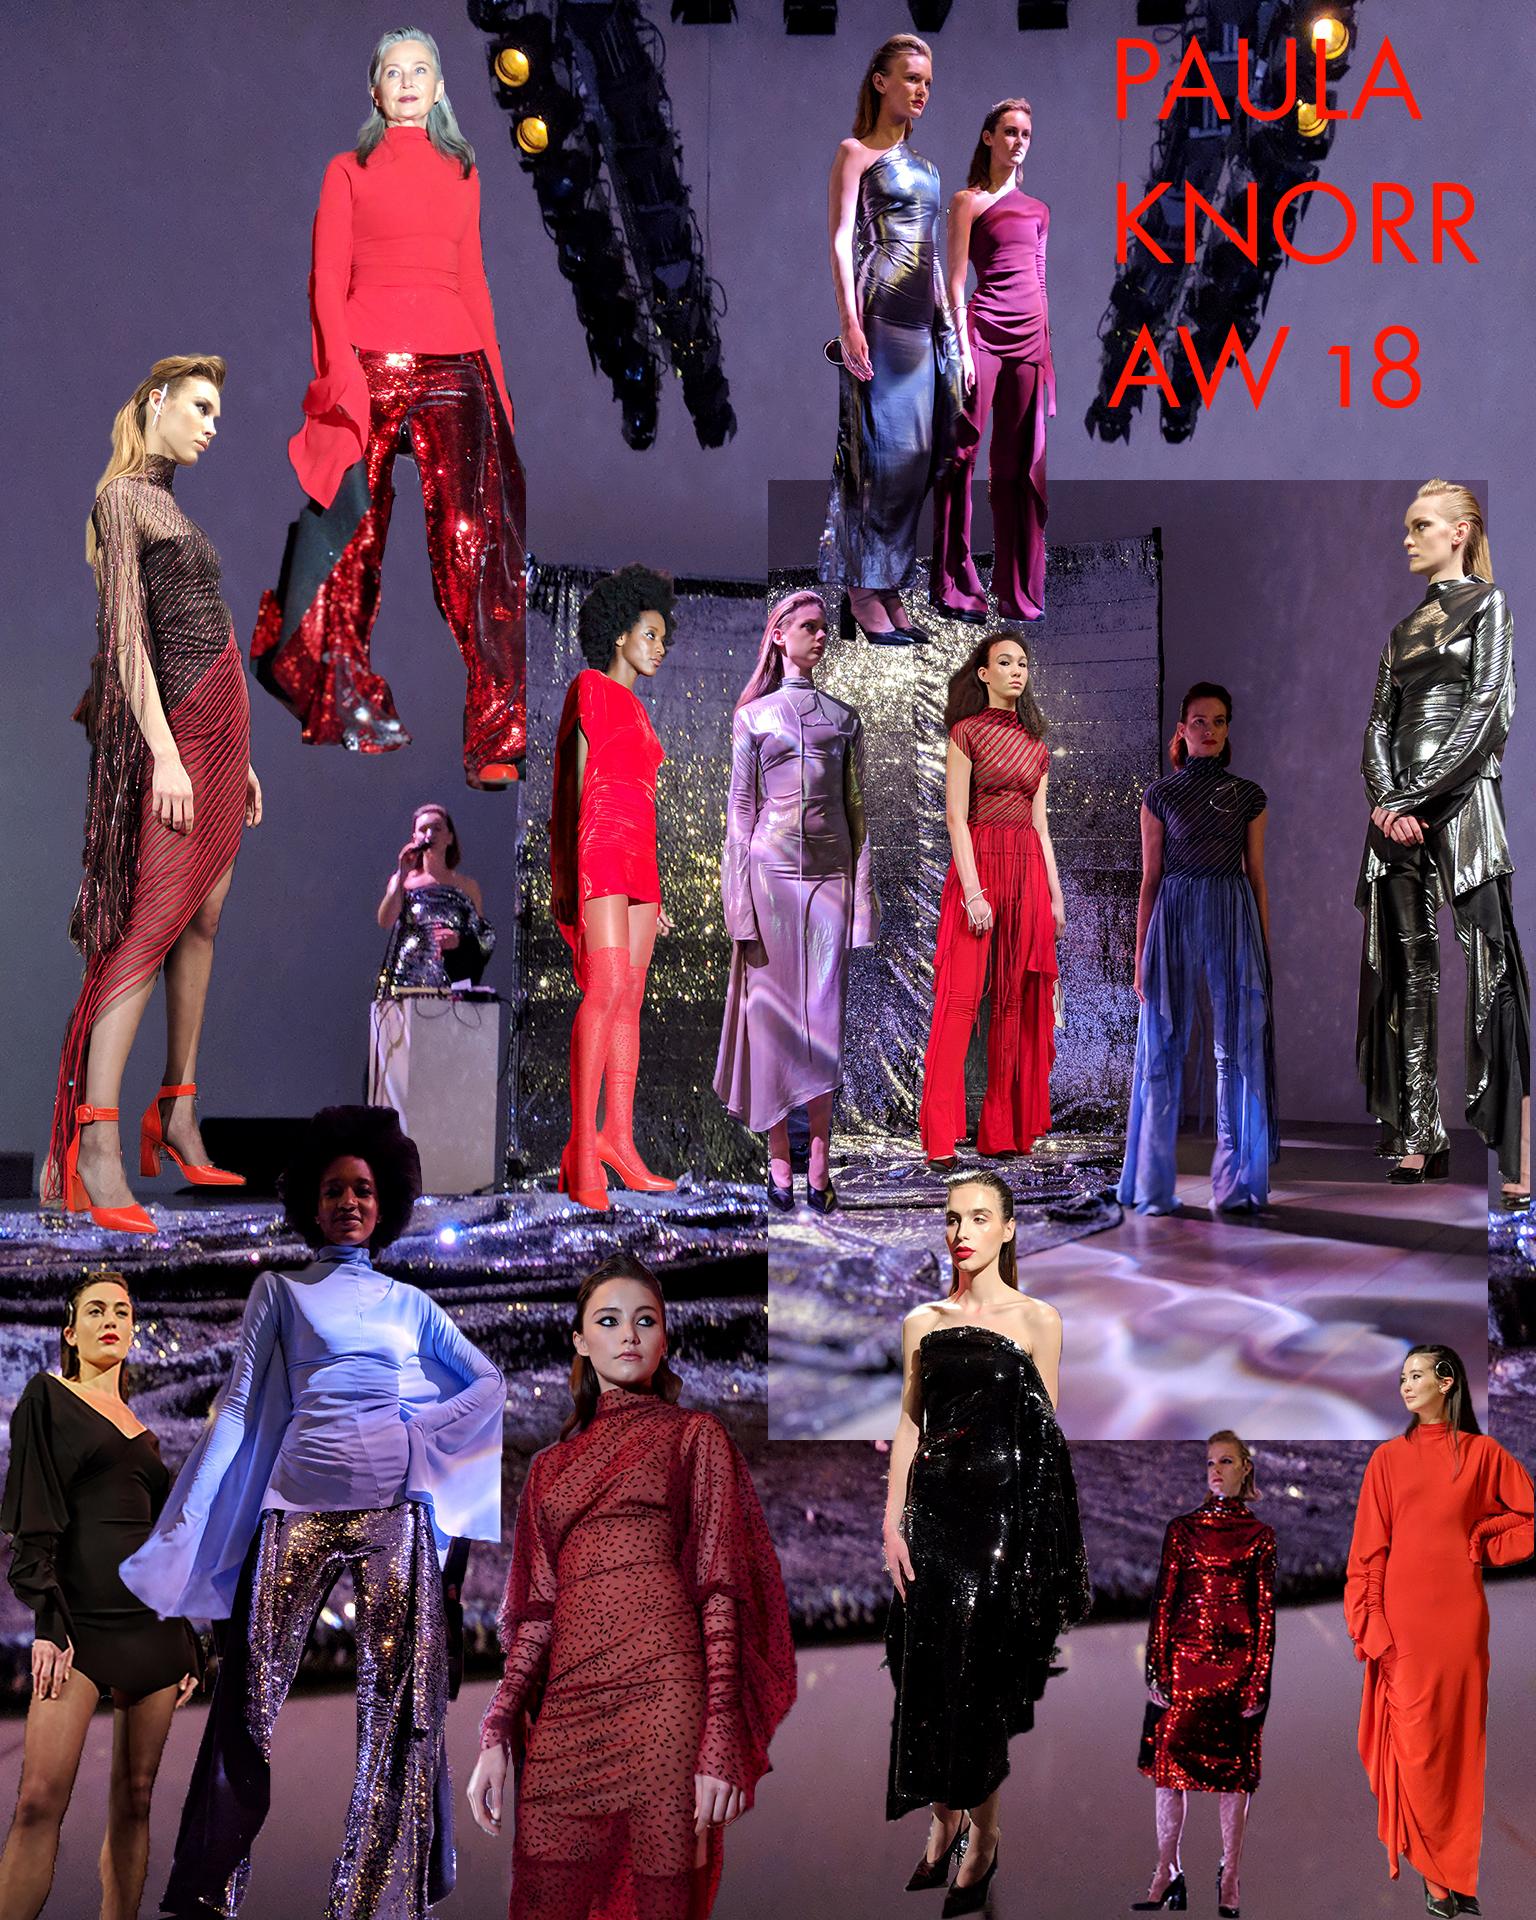 Paula Knorr fashion designer